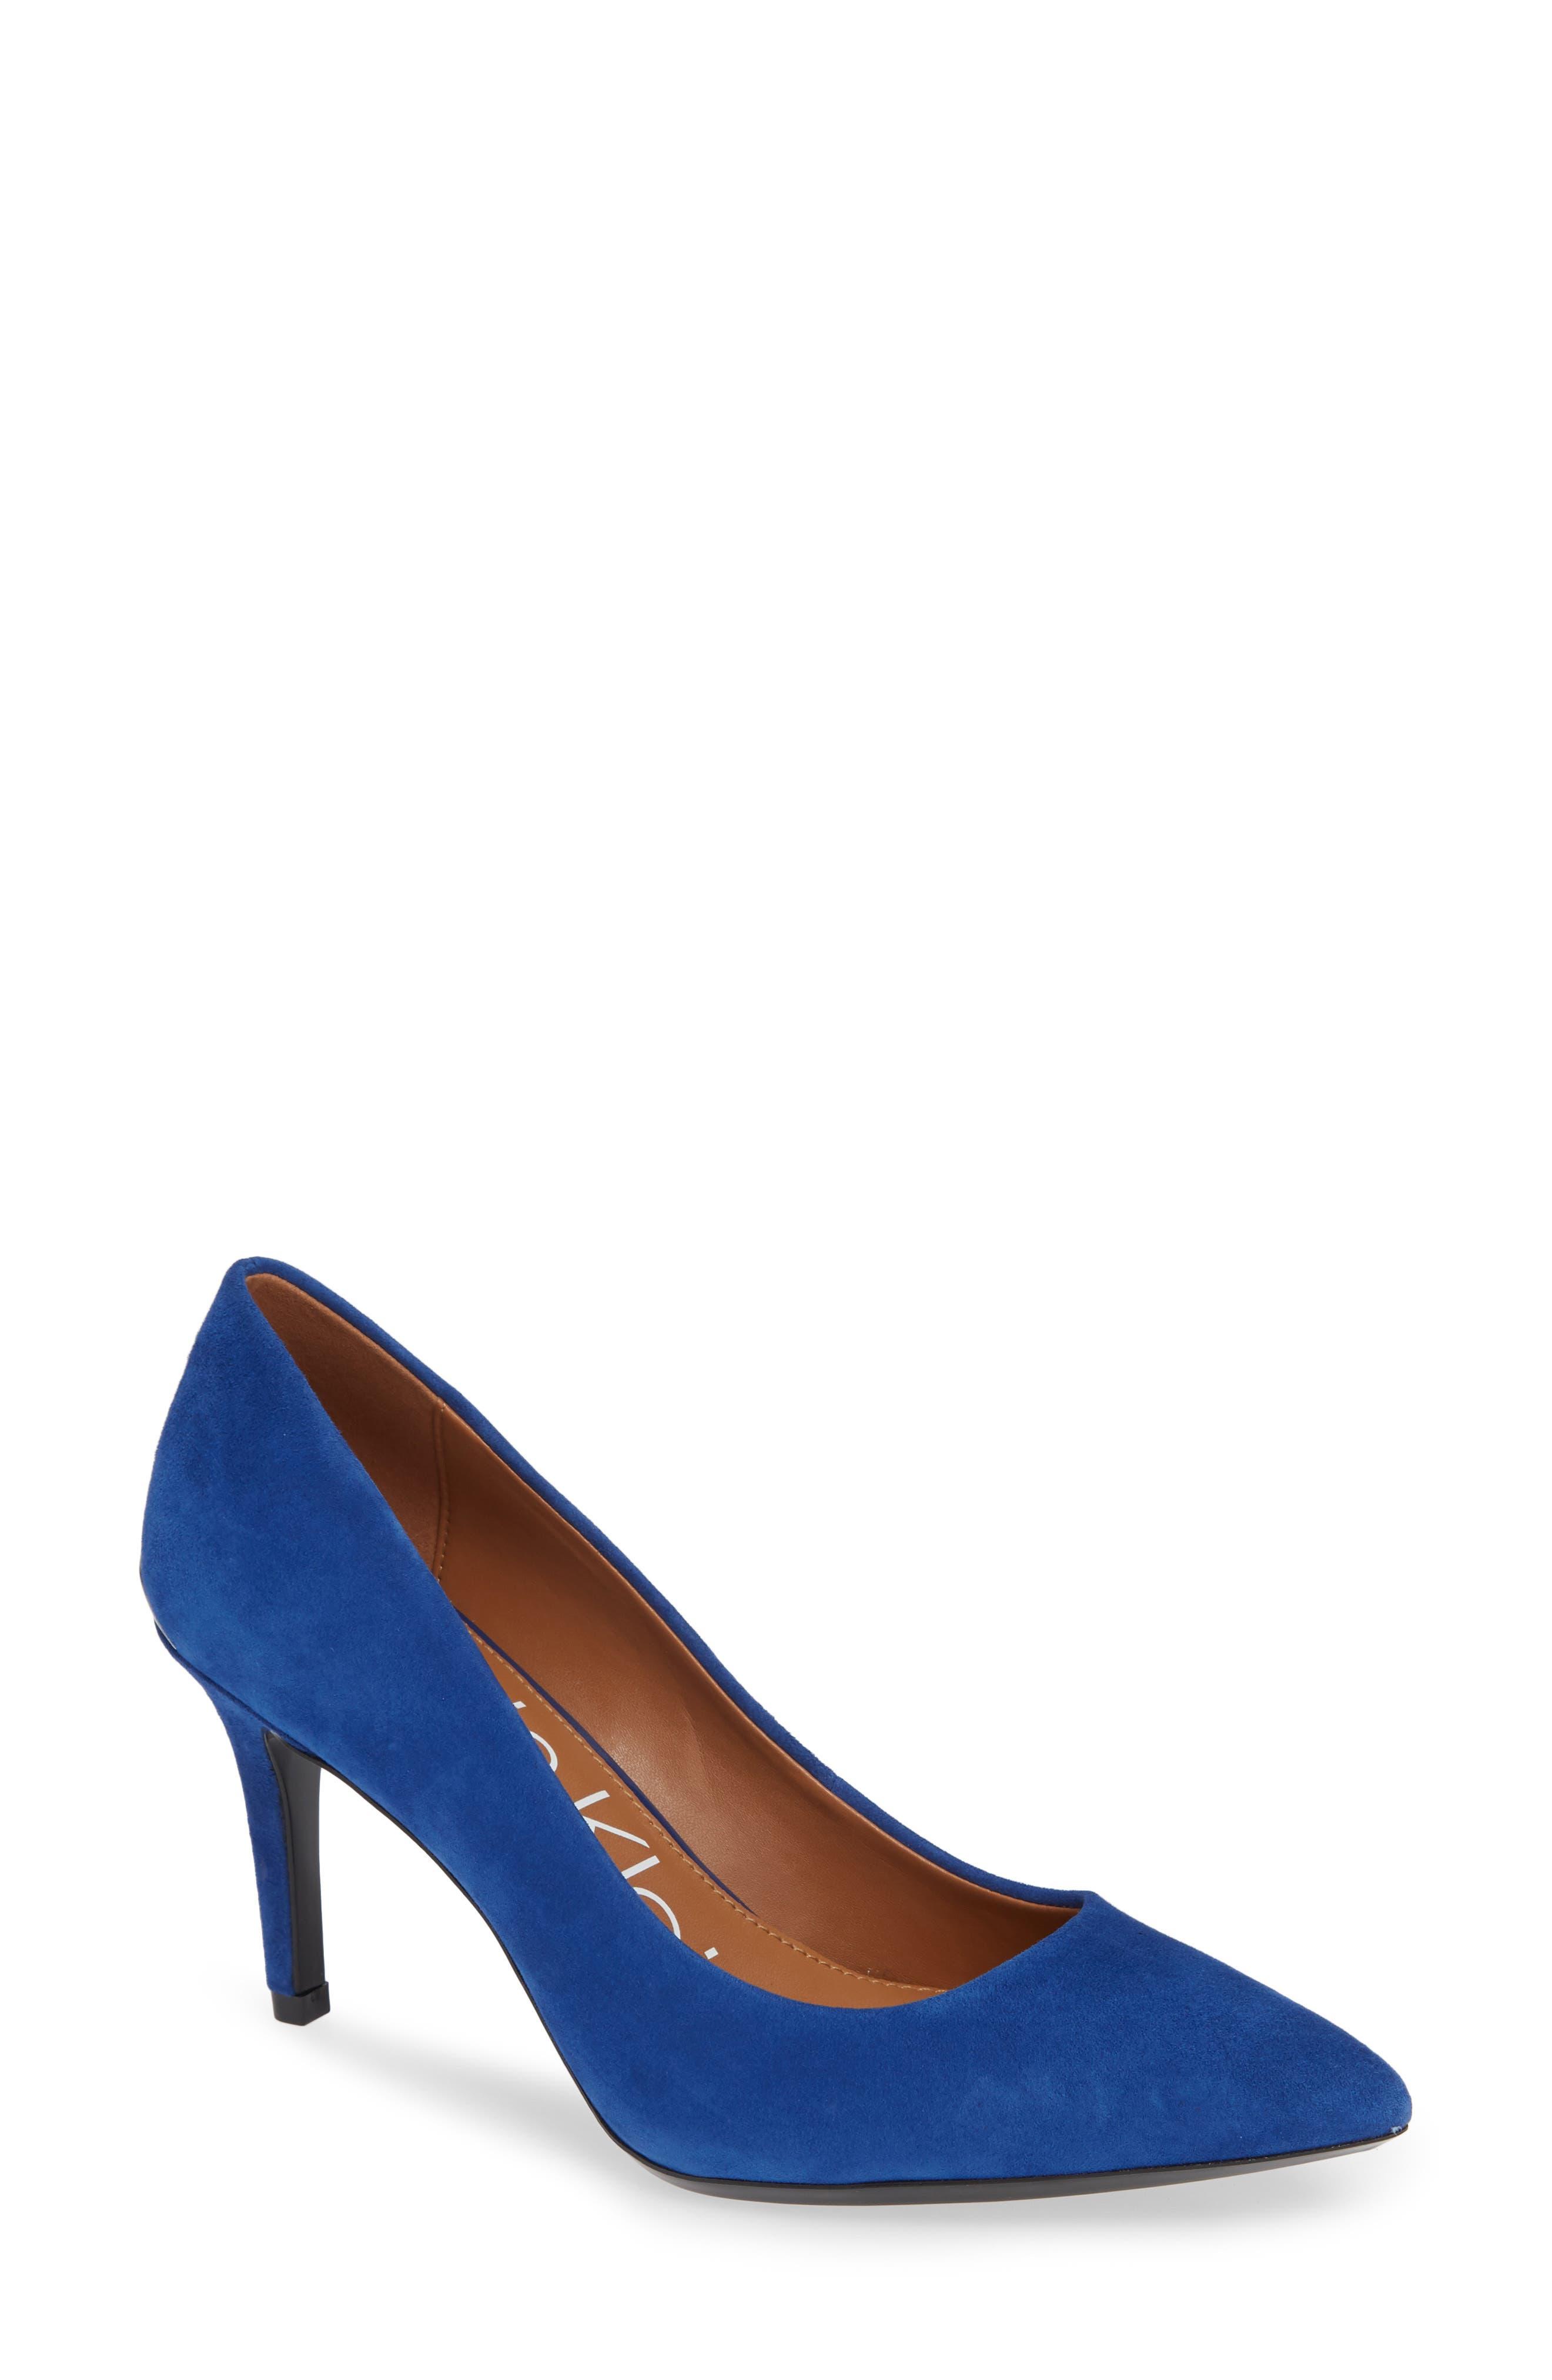 b1b595c4167 Calvin Klein  Gayle  Pointy Toe Pump- Blue